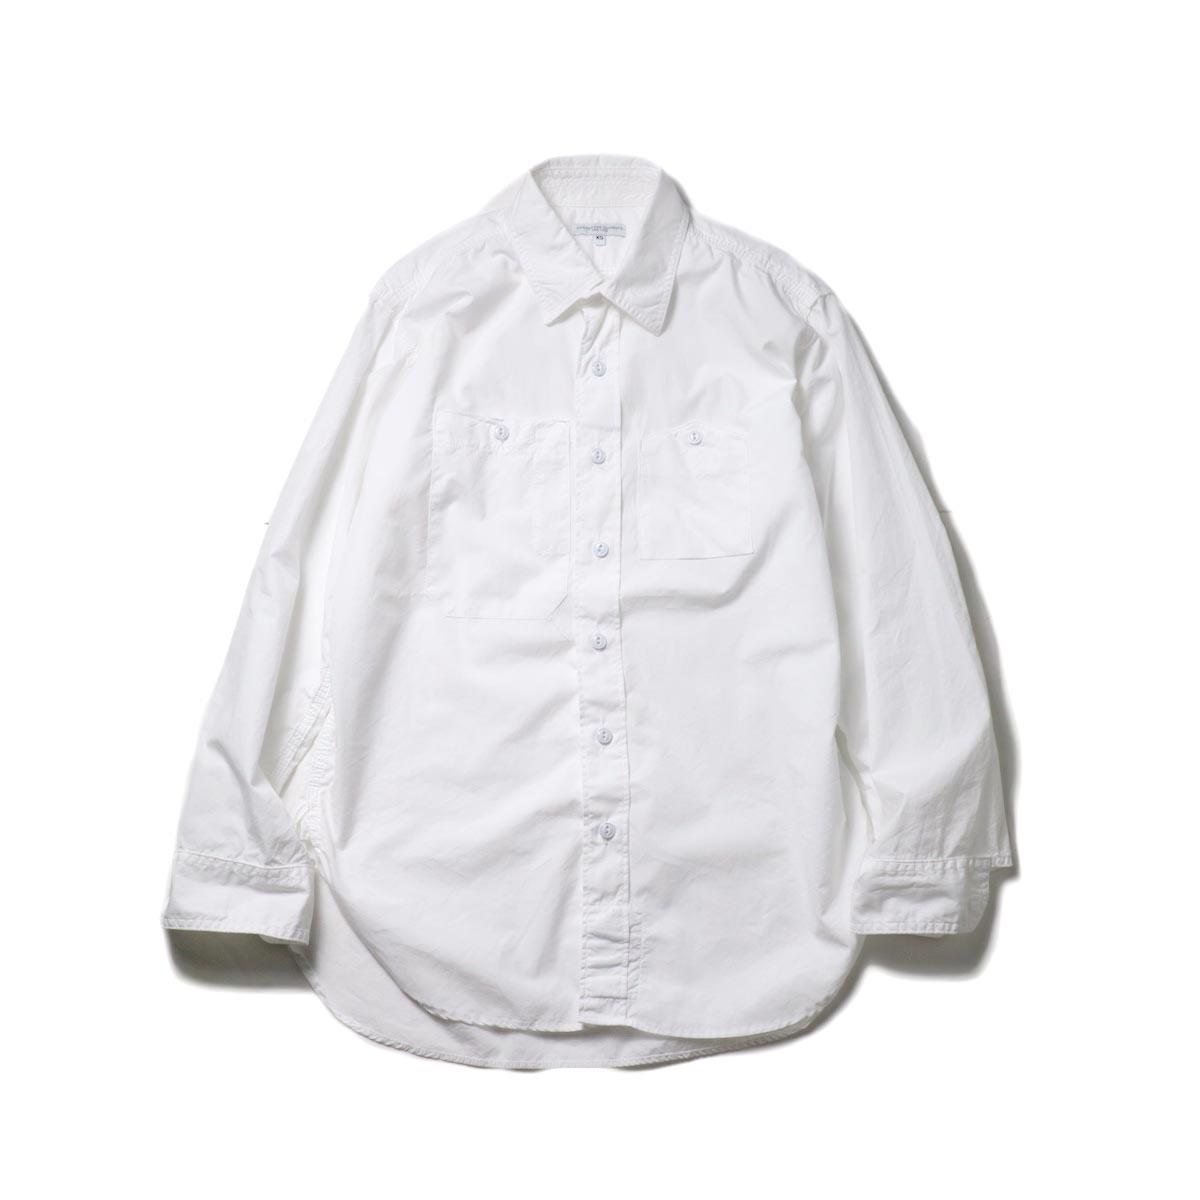 Engineered Garments / Work Shirt -100's 2Ply Broadcloth (White)